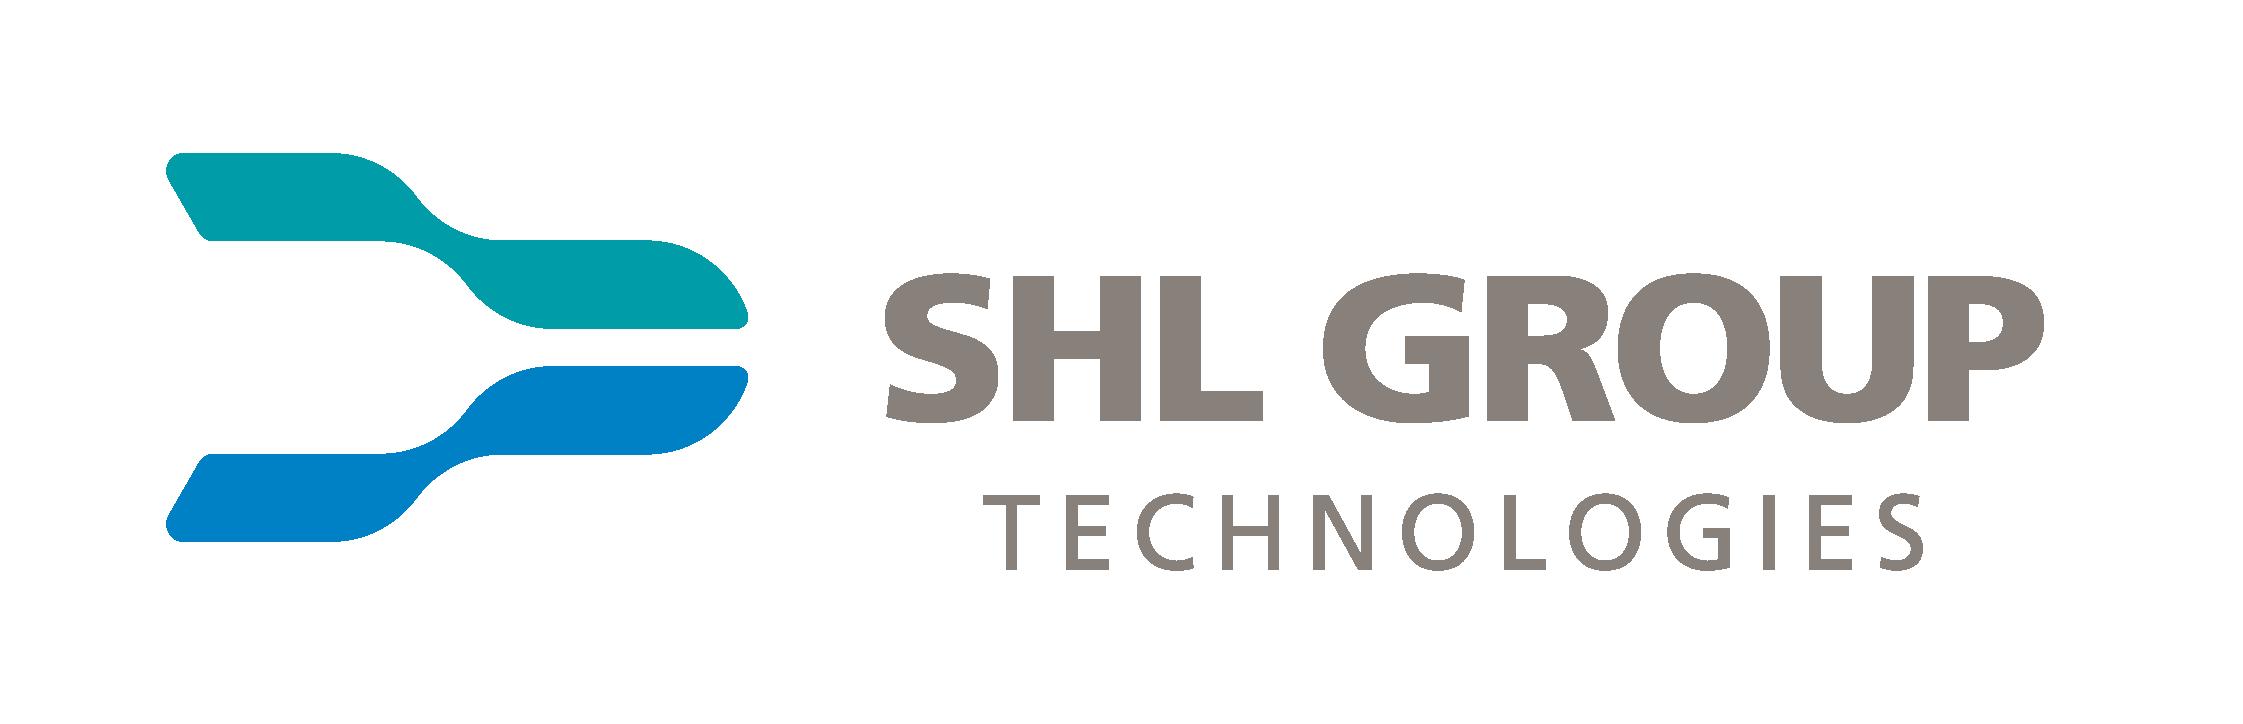 Technologies 1